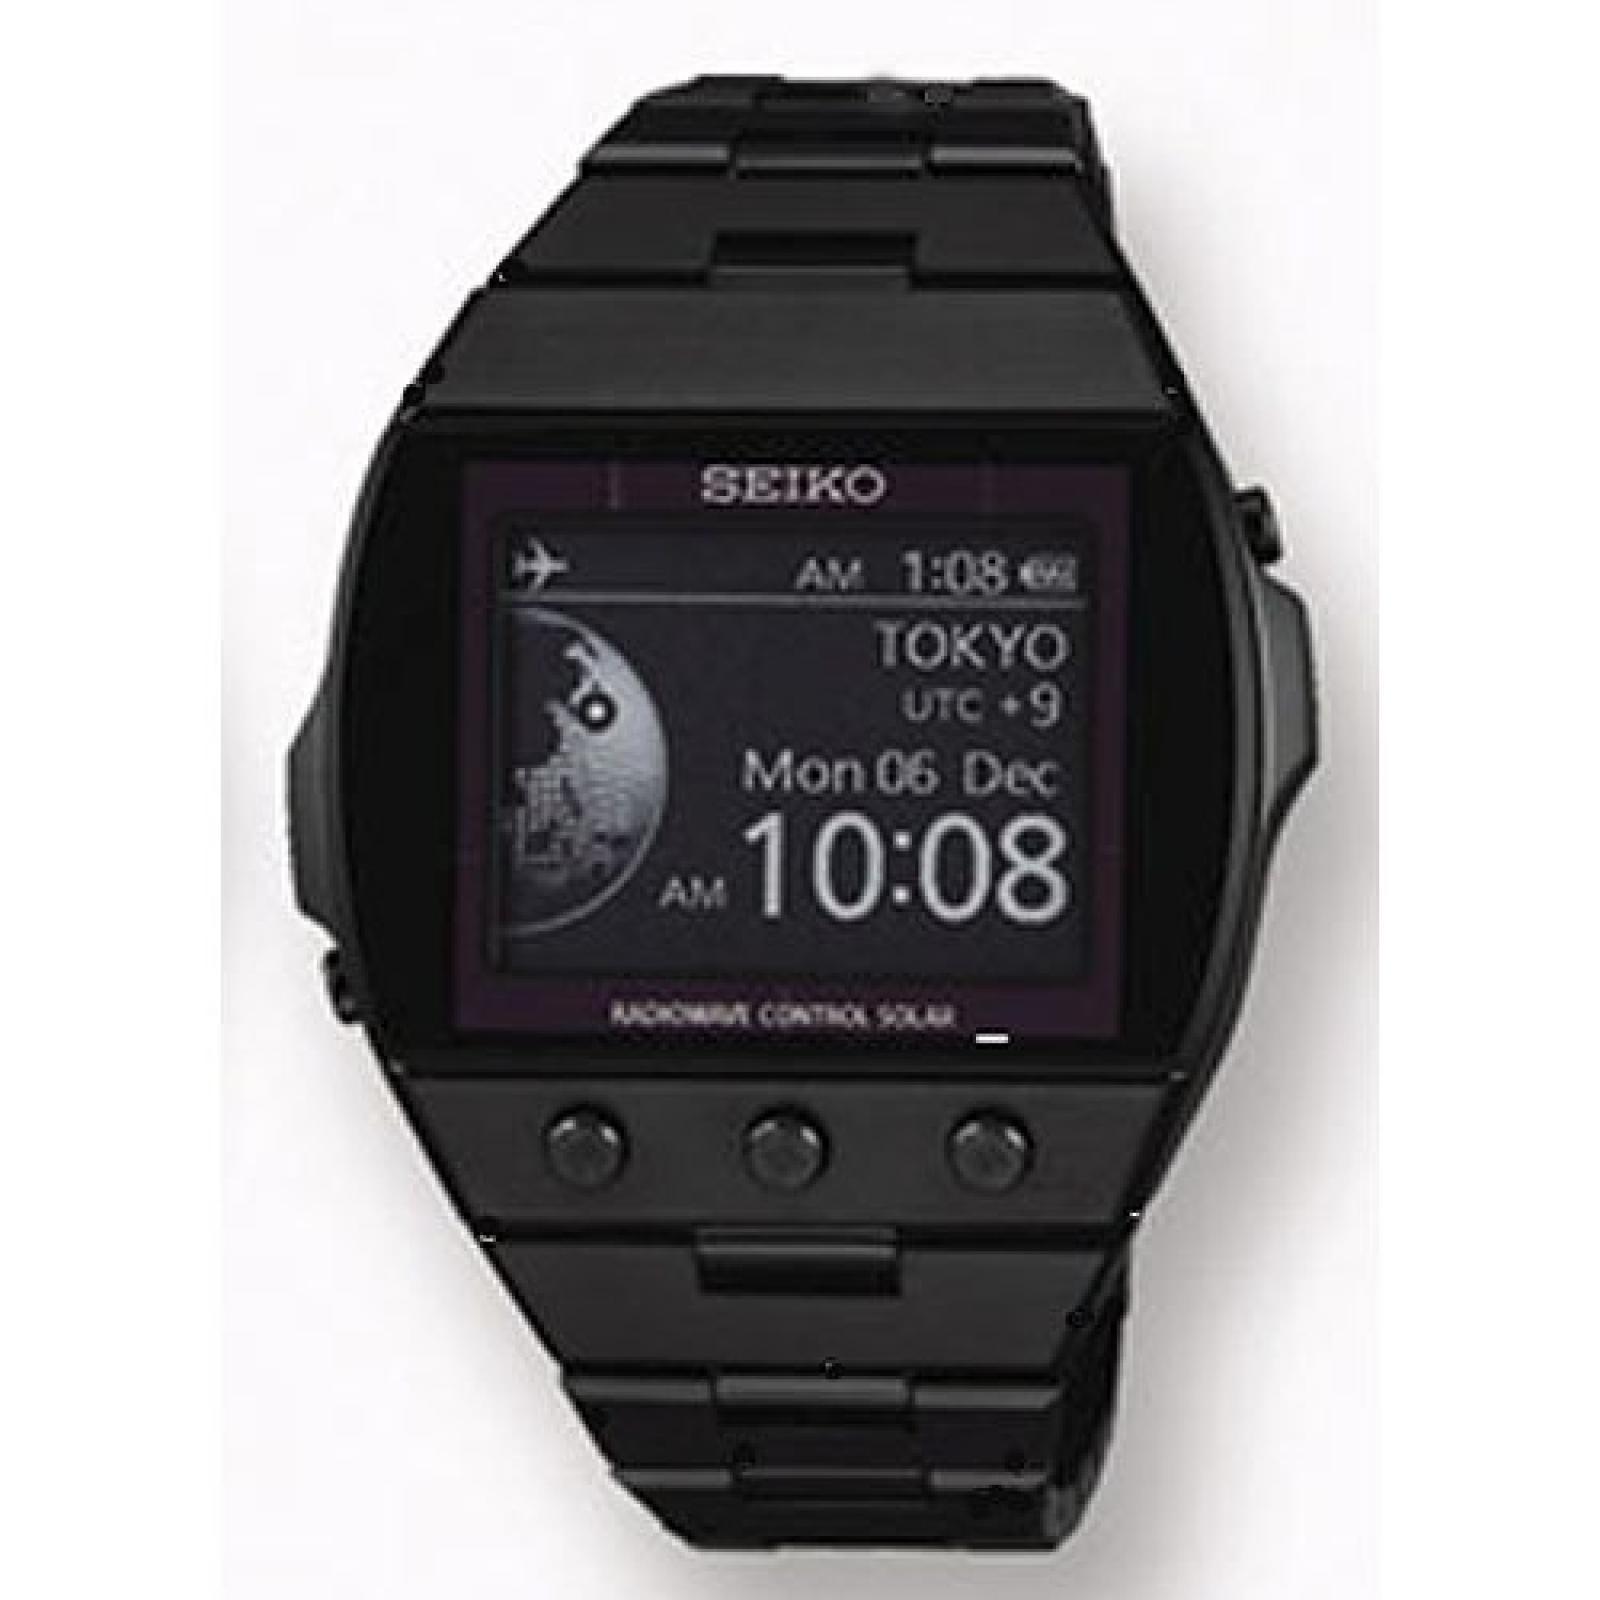 Uhr Seiko E-ink Sdga003j Unisex Kombiniert